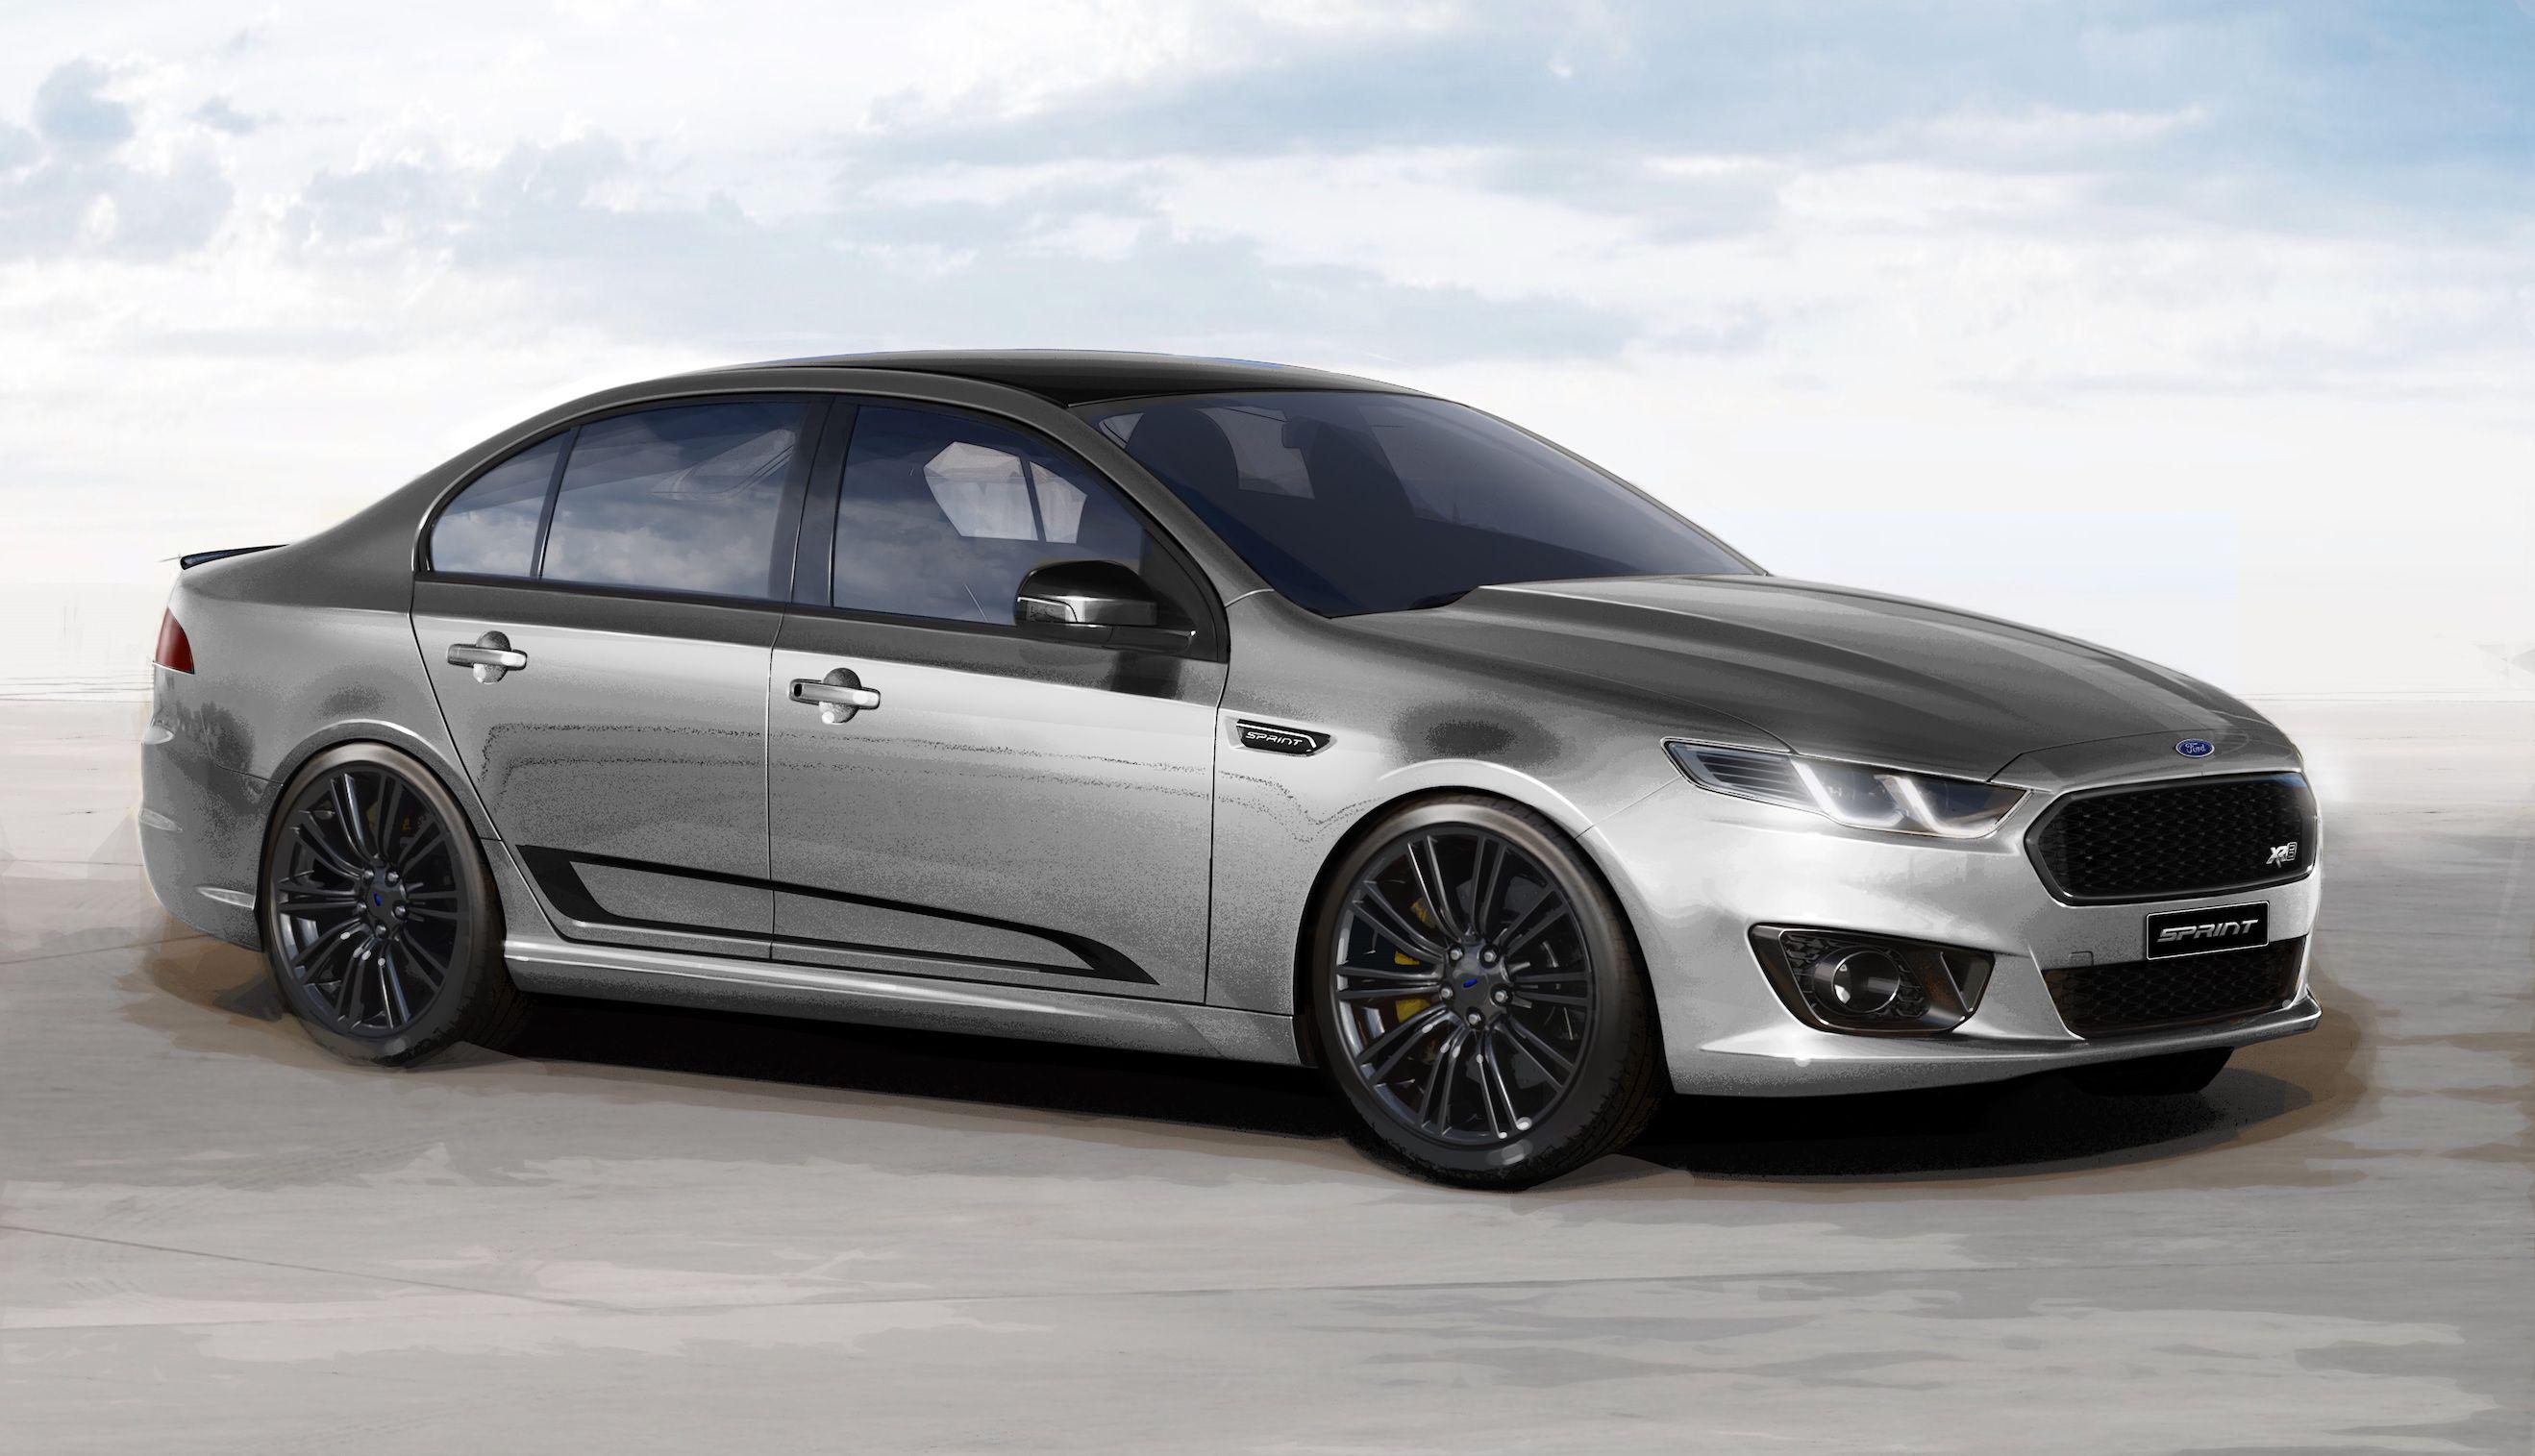 2016 Ford Falcon Xr6 Turbo Sprint Xr8 Sprint Make Online Debut